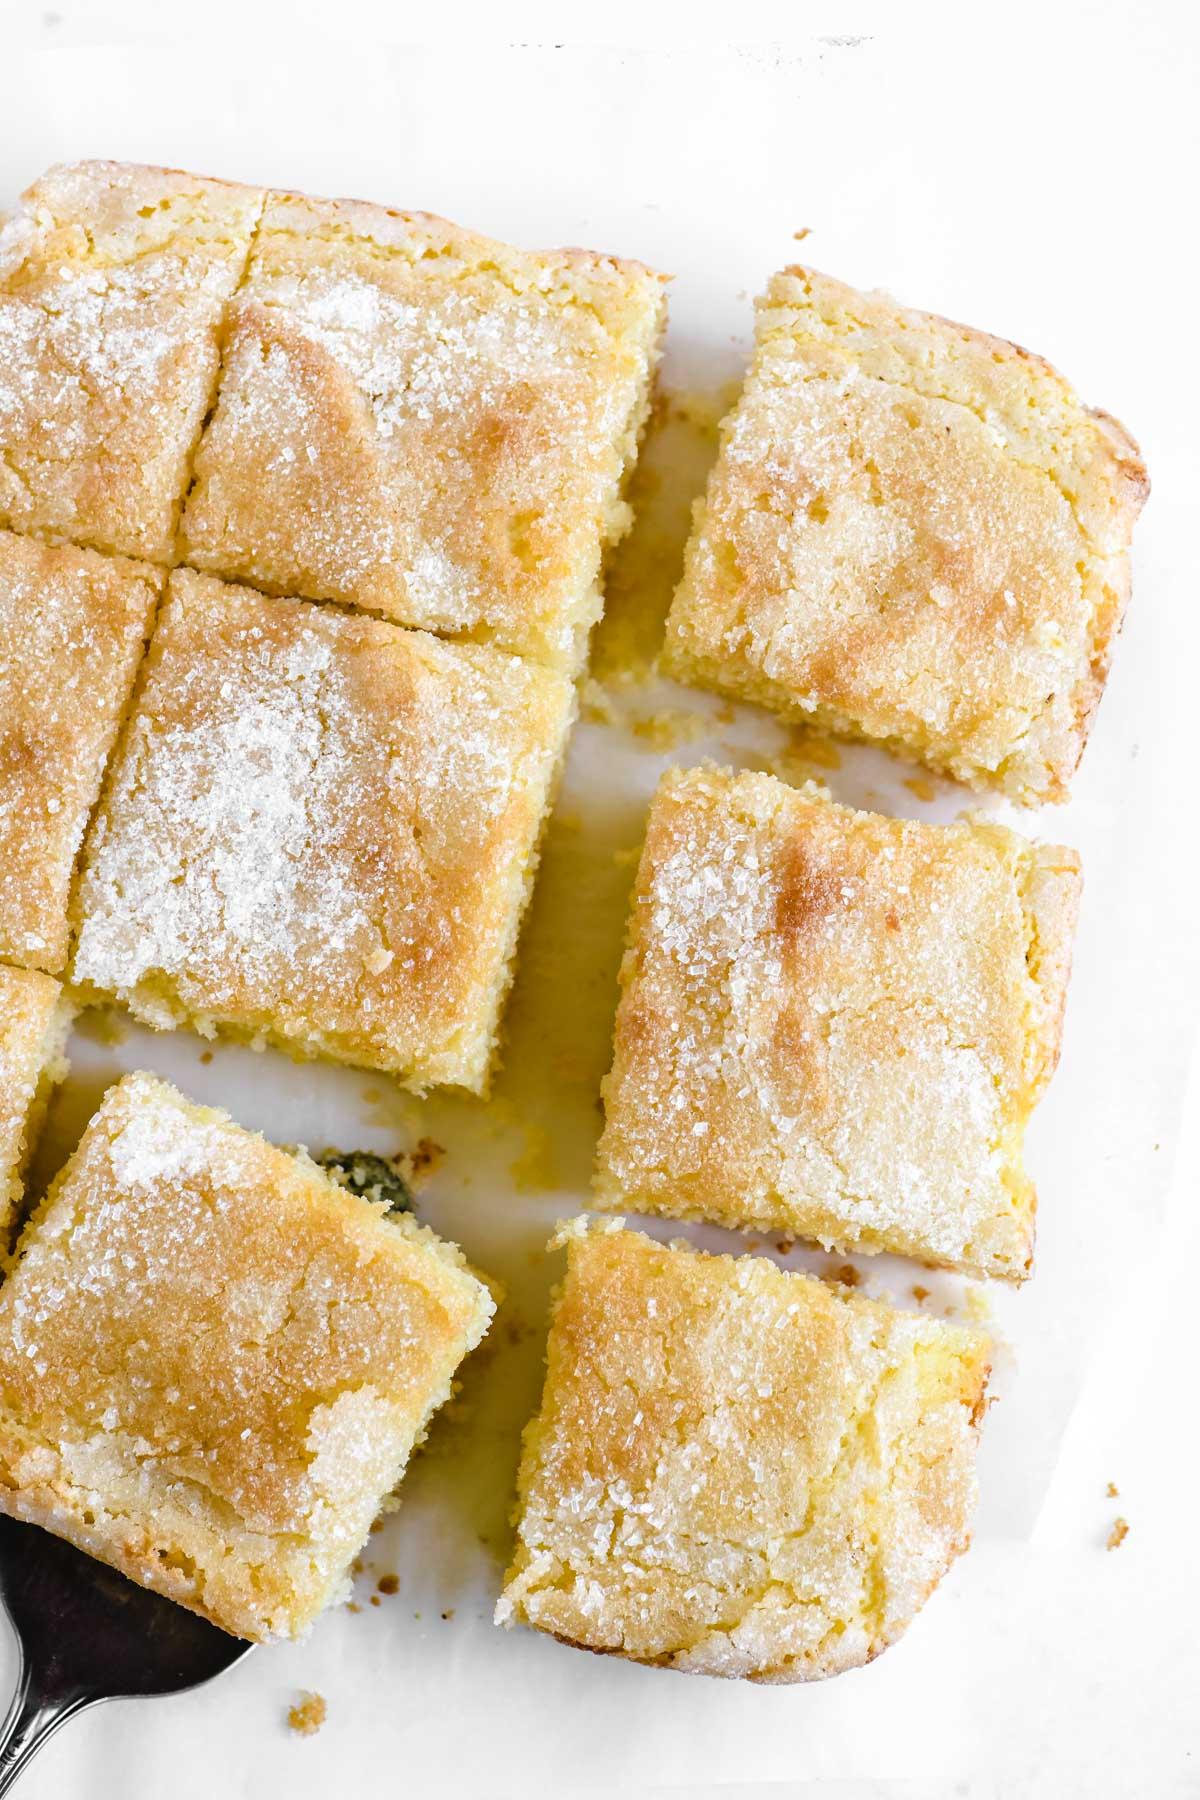 a lemon crunch cake, sliced, on parchment paper